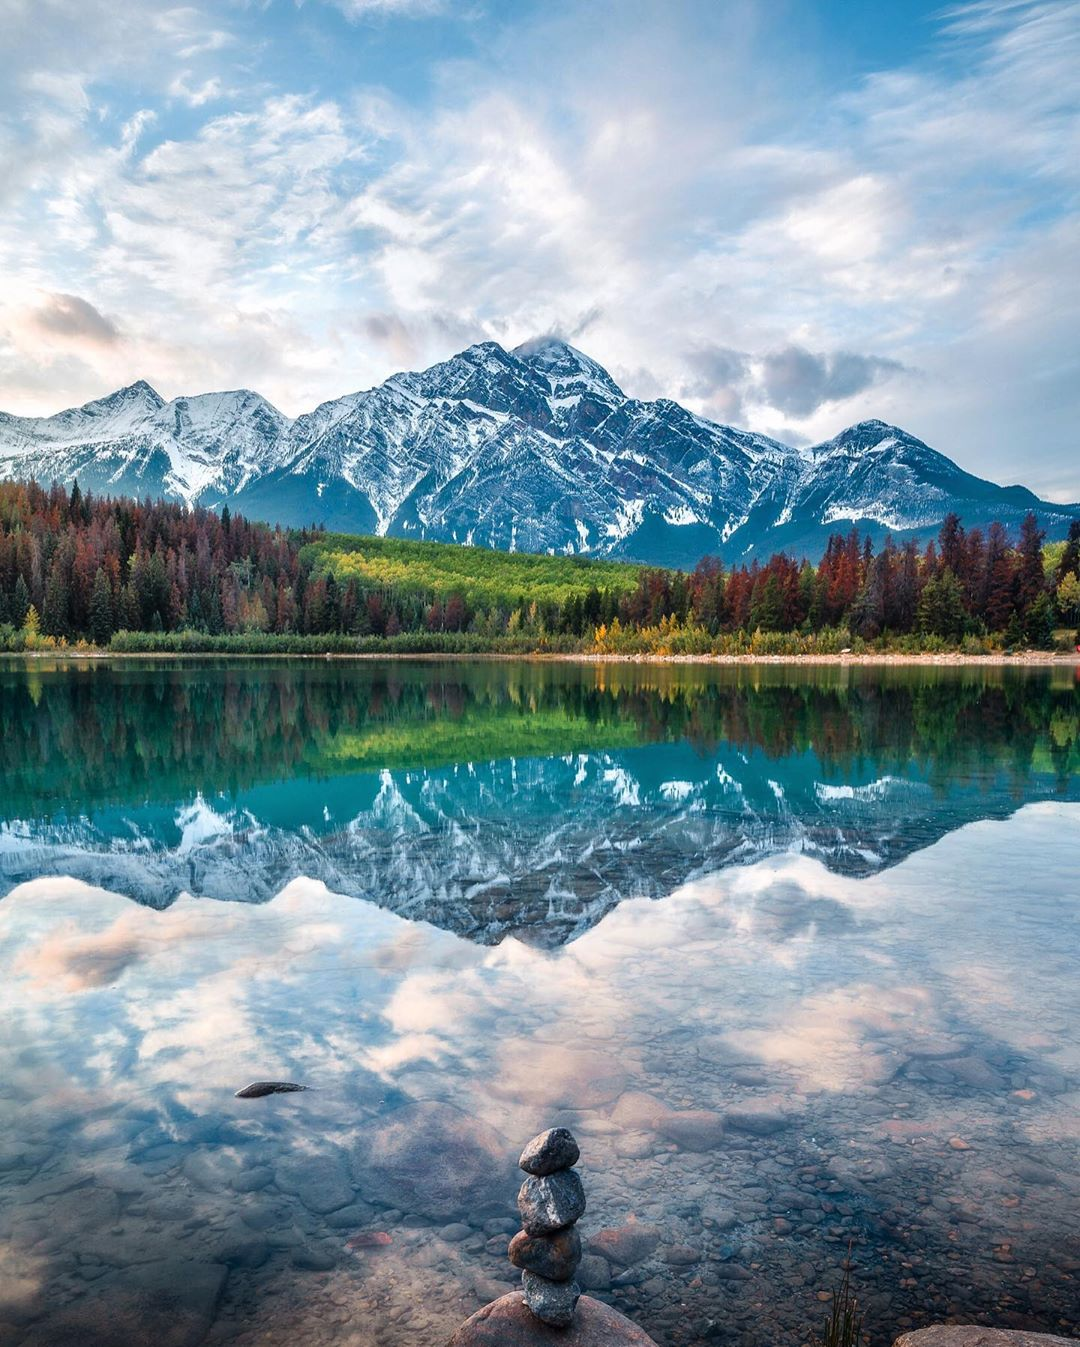 Природа и путешествия на снимках Энди Ву